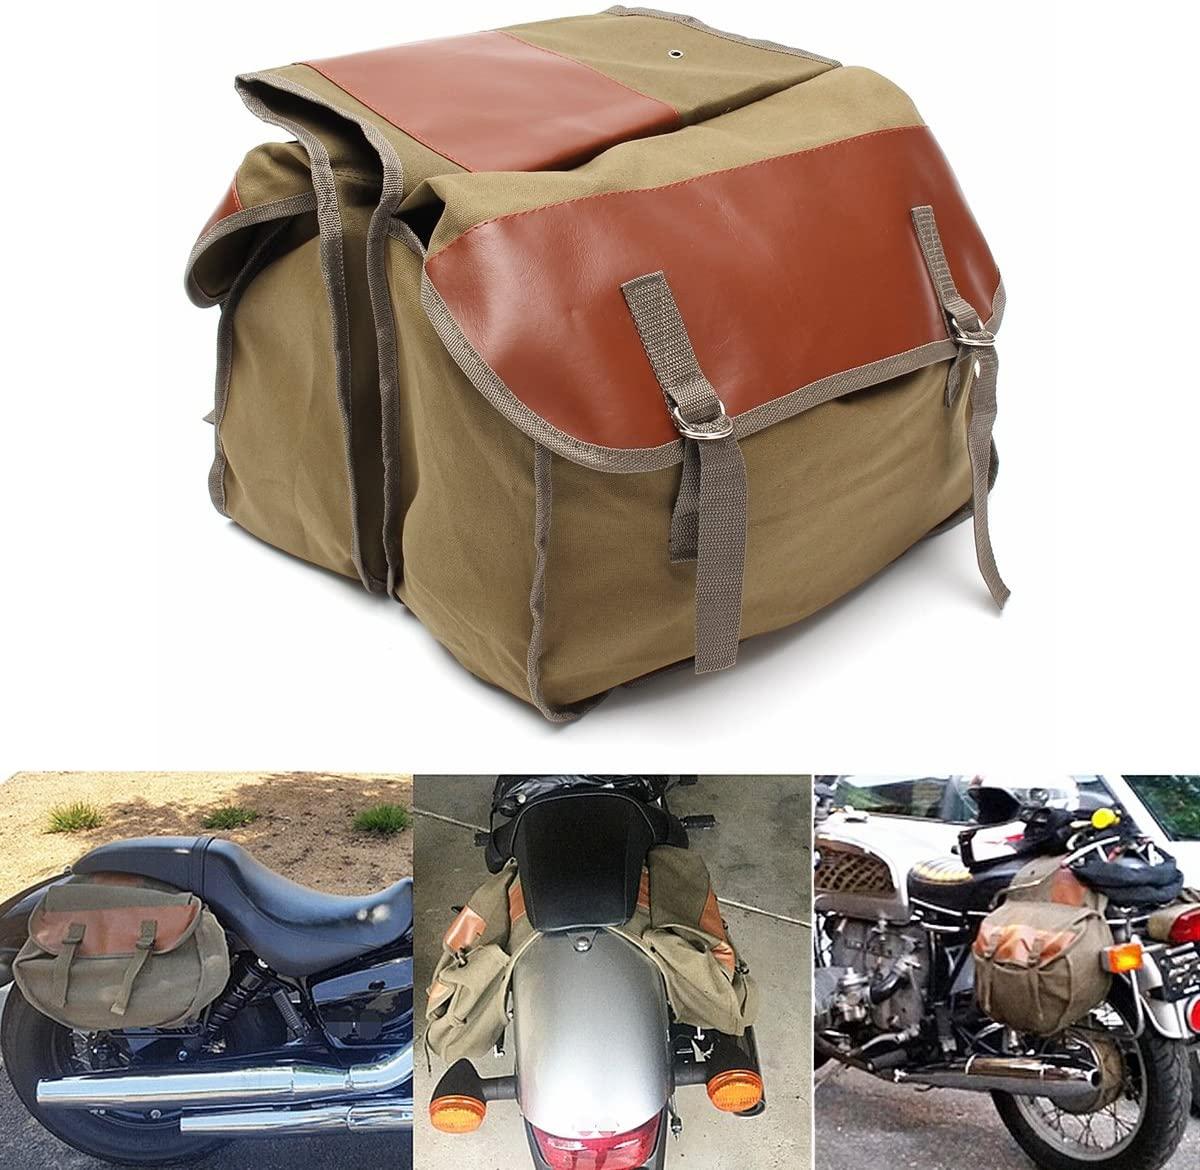 Alamor Motorcycle Canvas Saddlebags Equine Back Pack For Haley Sportster/Honda